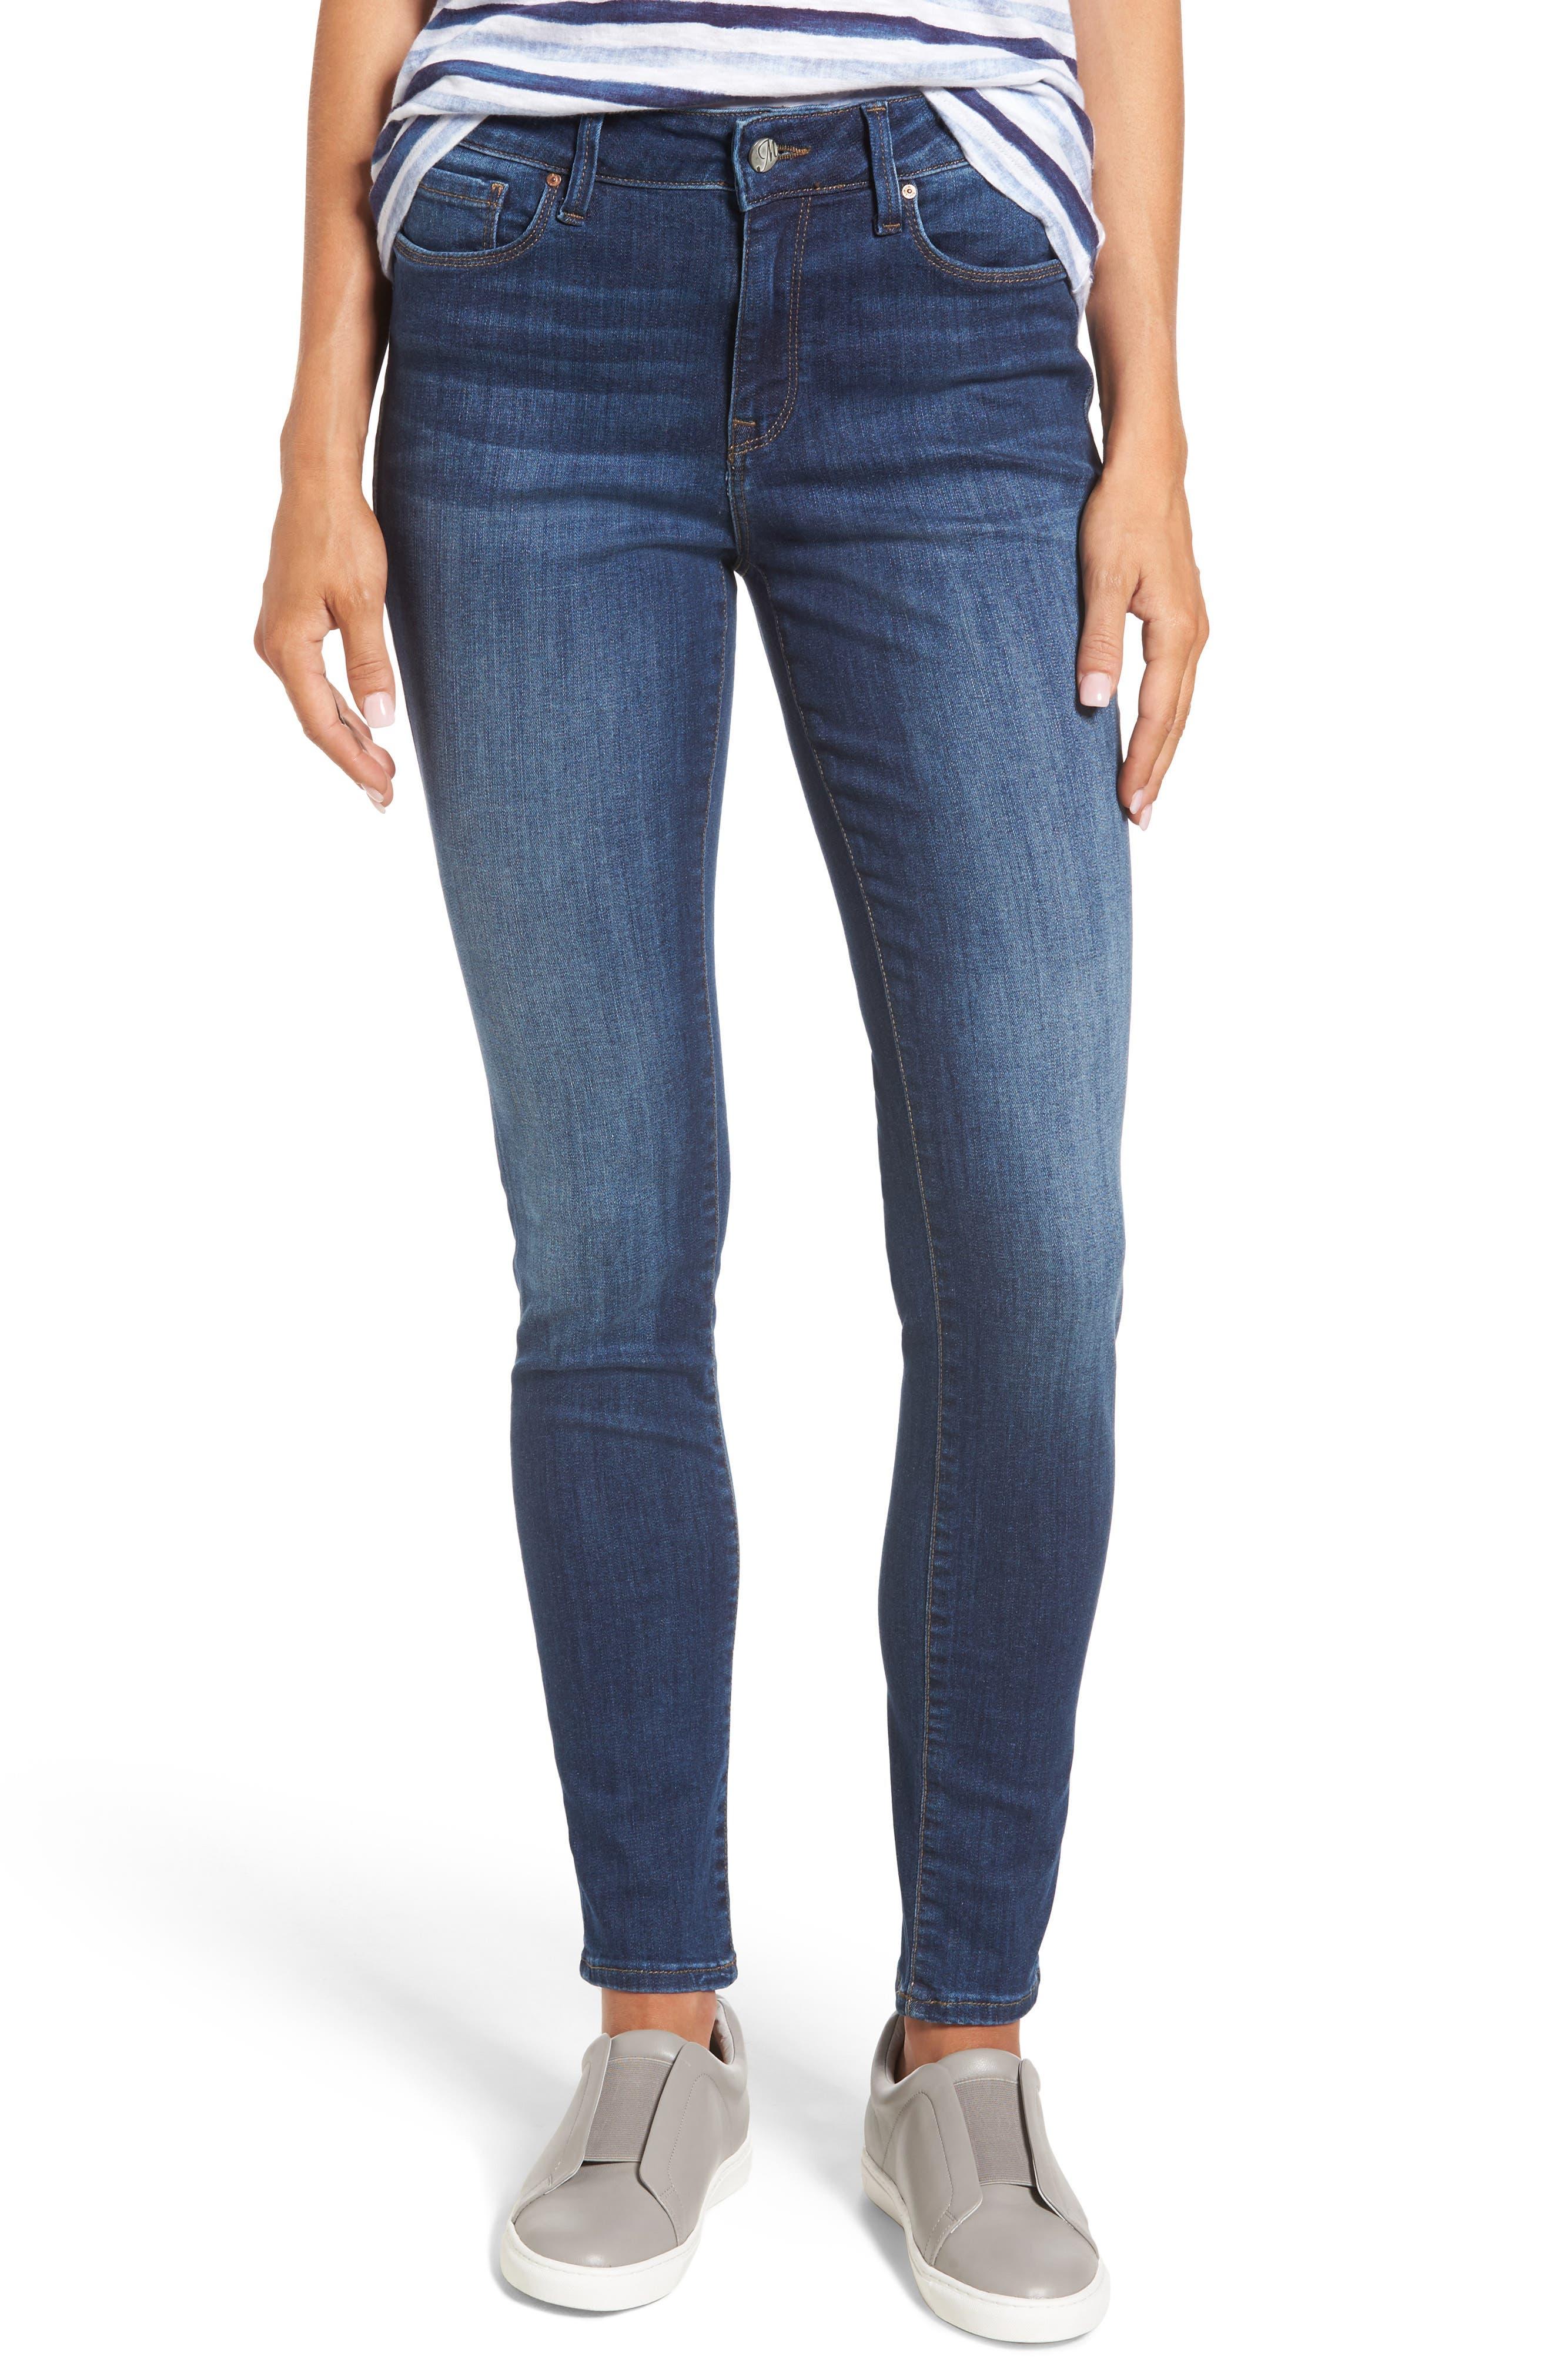 Alissa Super Skinny Jeans,                             Main thumbnail 1, color,                             Dark Indigo Tribeca